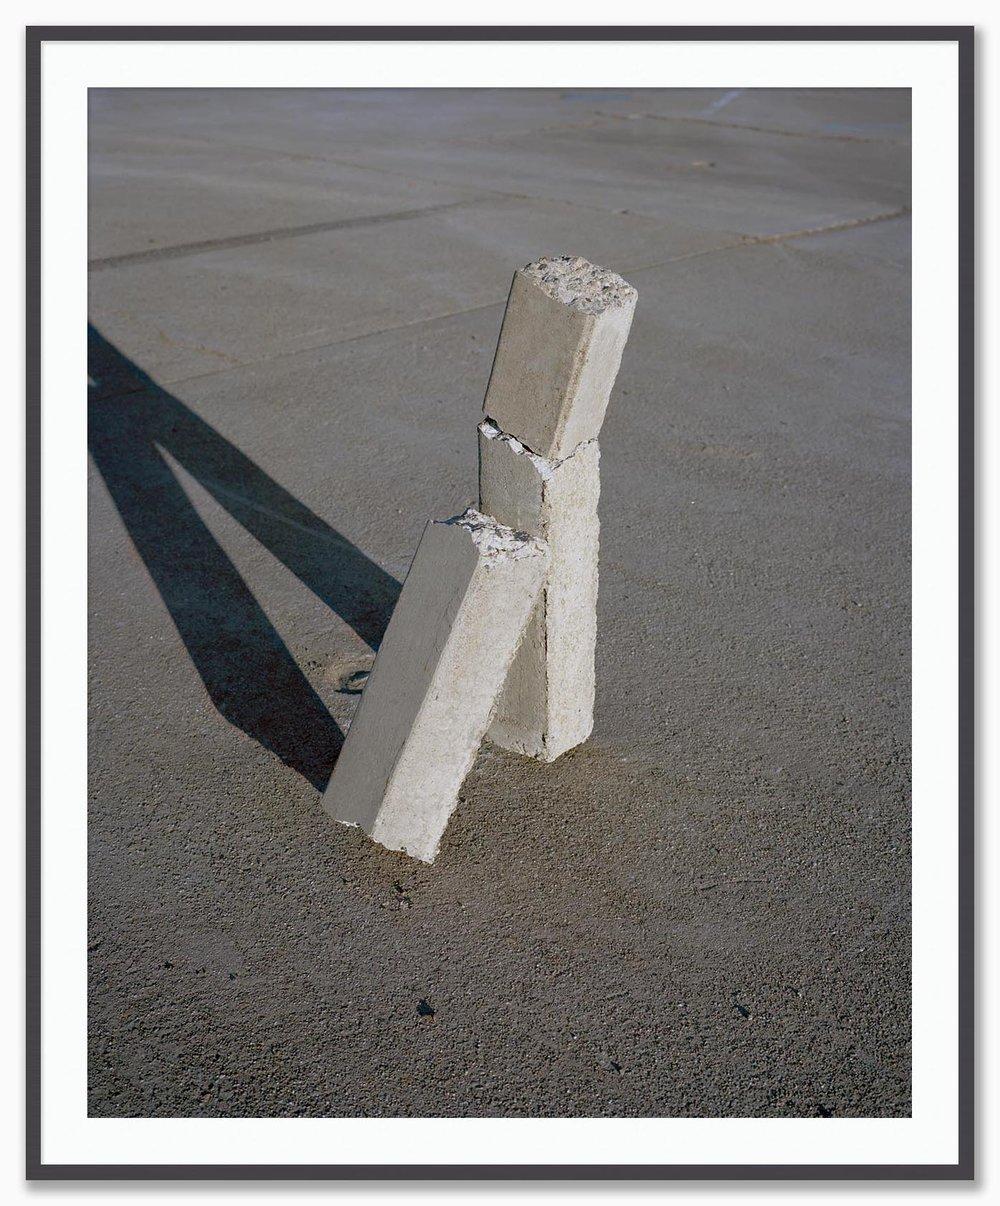 concrete_Mat_Dusk.jpg